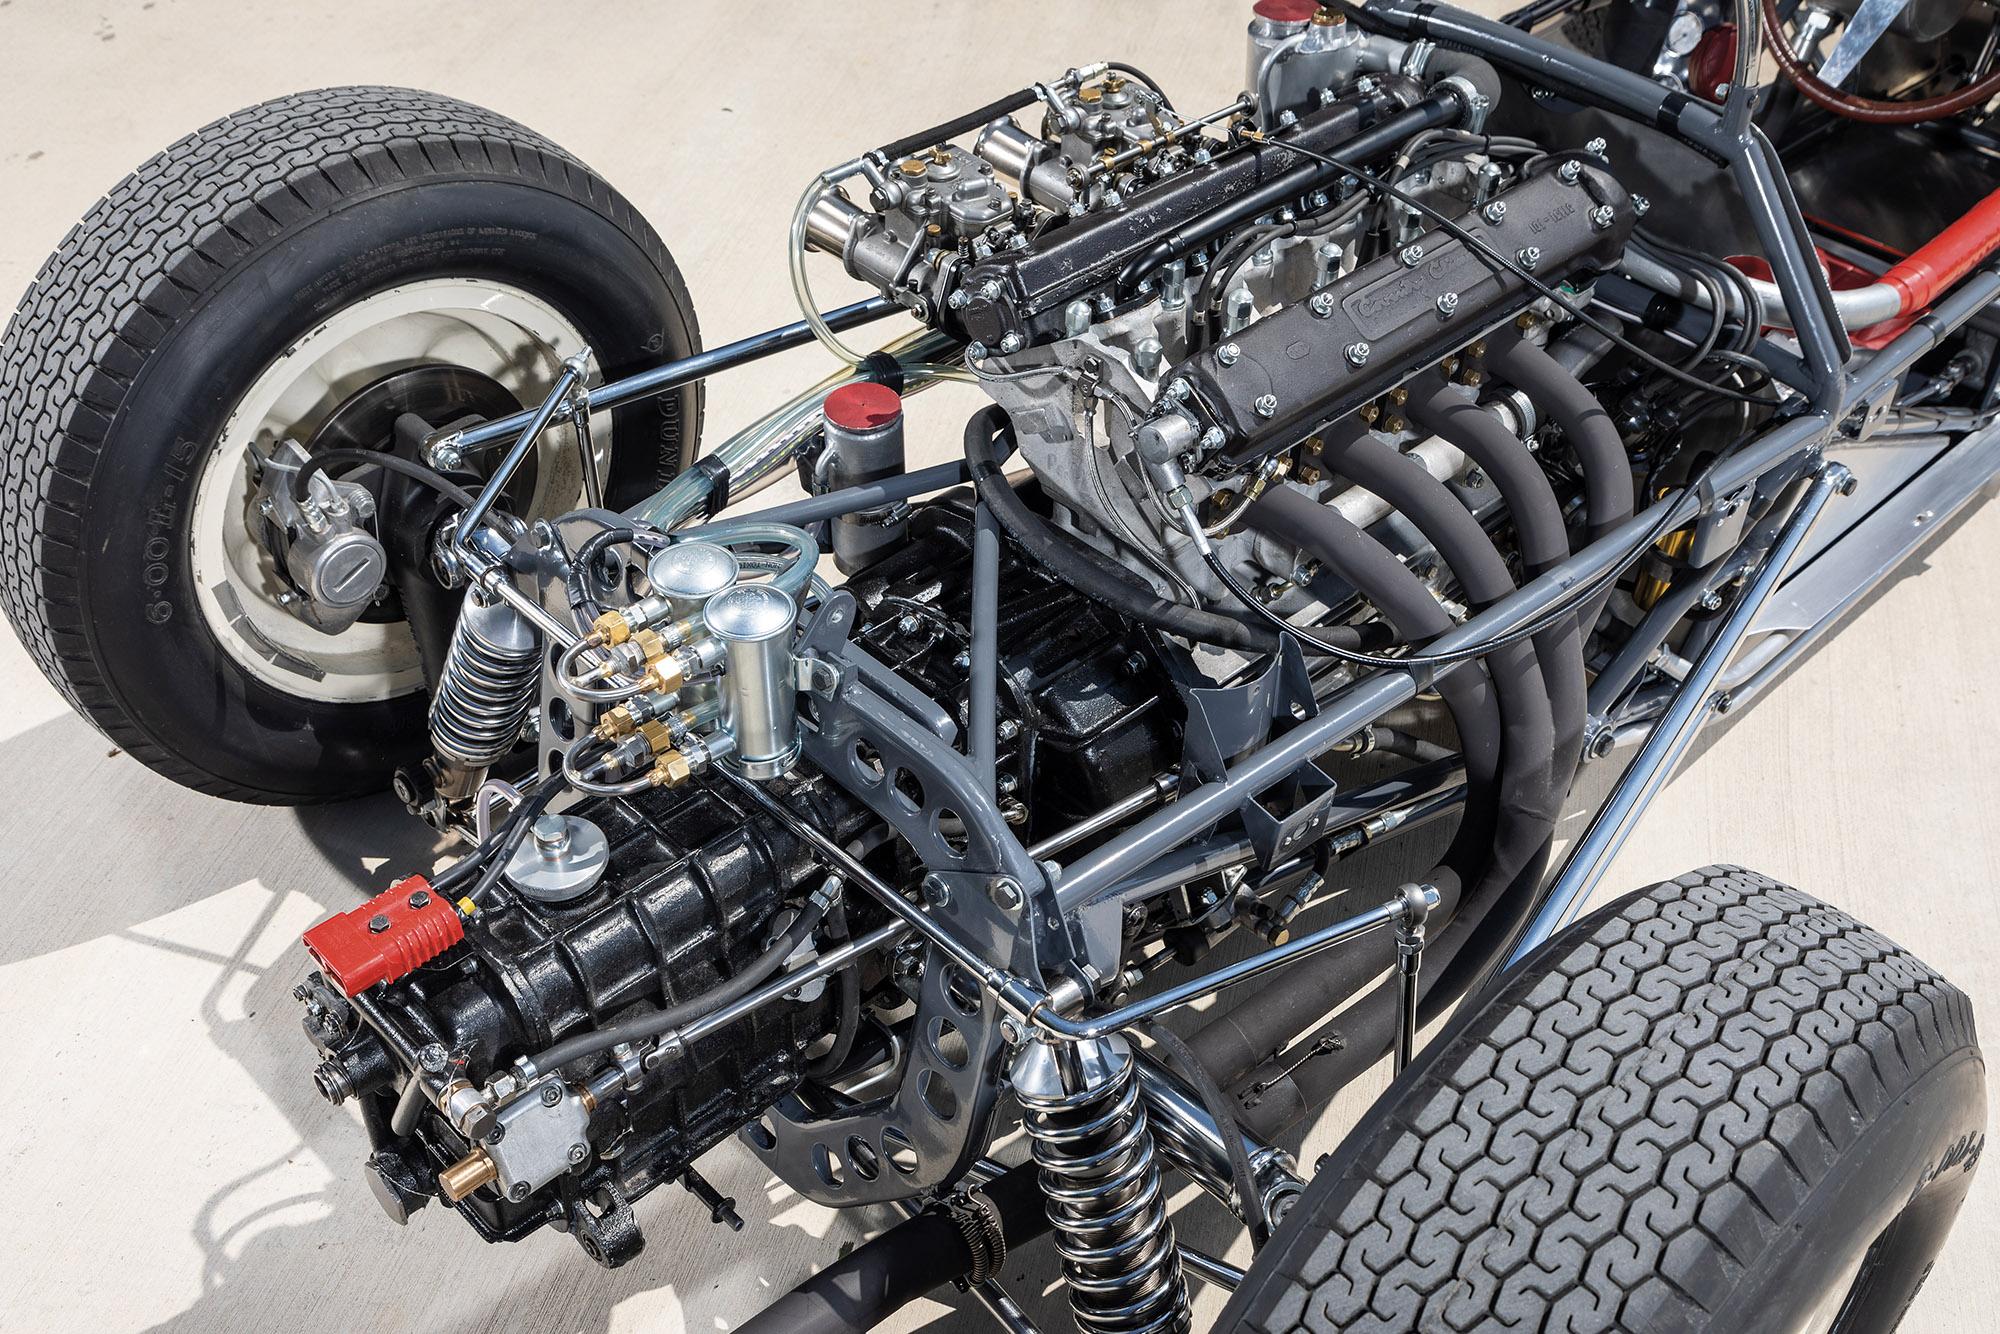 1961 Stirling Moss Monaco winning Lotus 18 engine